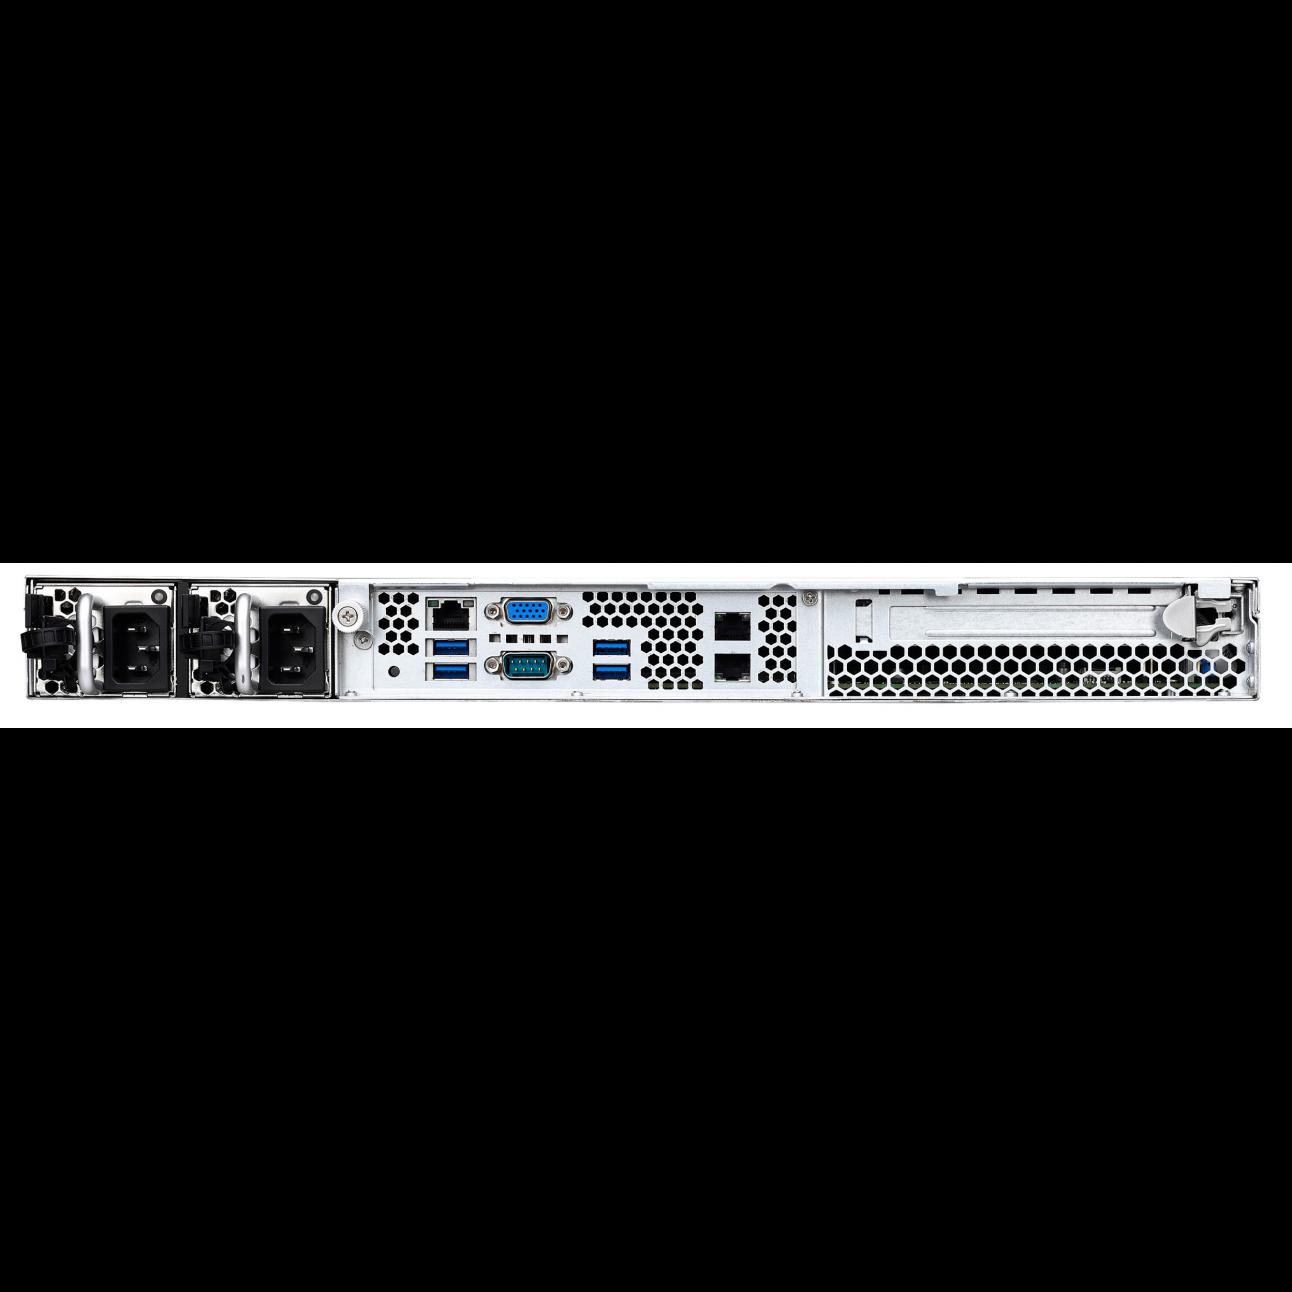 Серверная платформа SNR-SR160R-V5, 1U, E3-1200v5, DDR4, 4xHDD, резервируемый БП